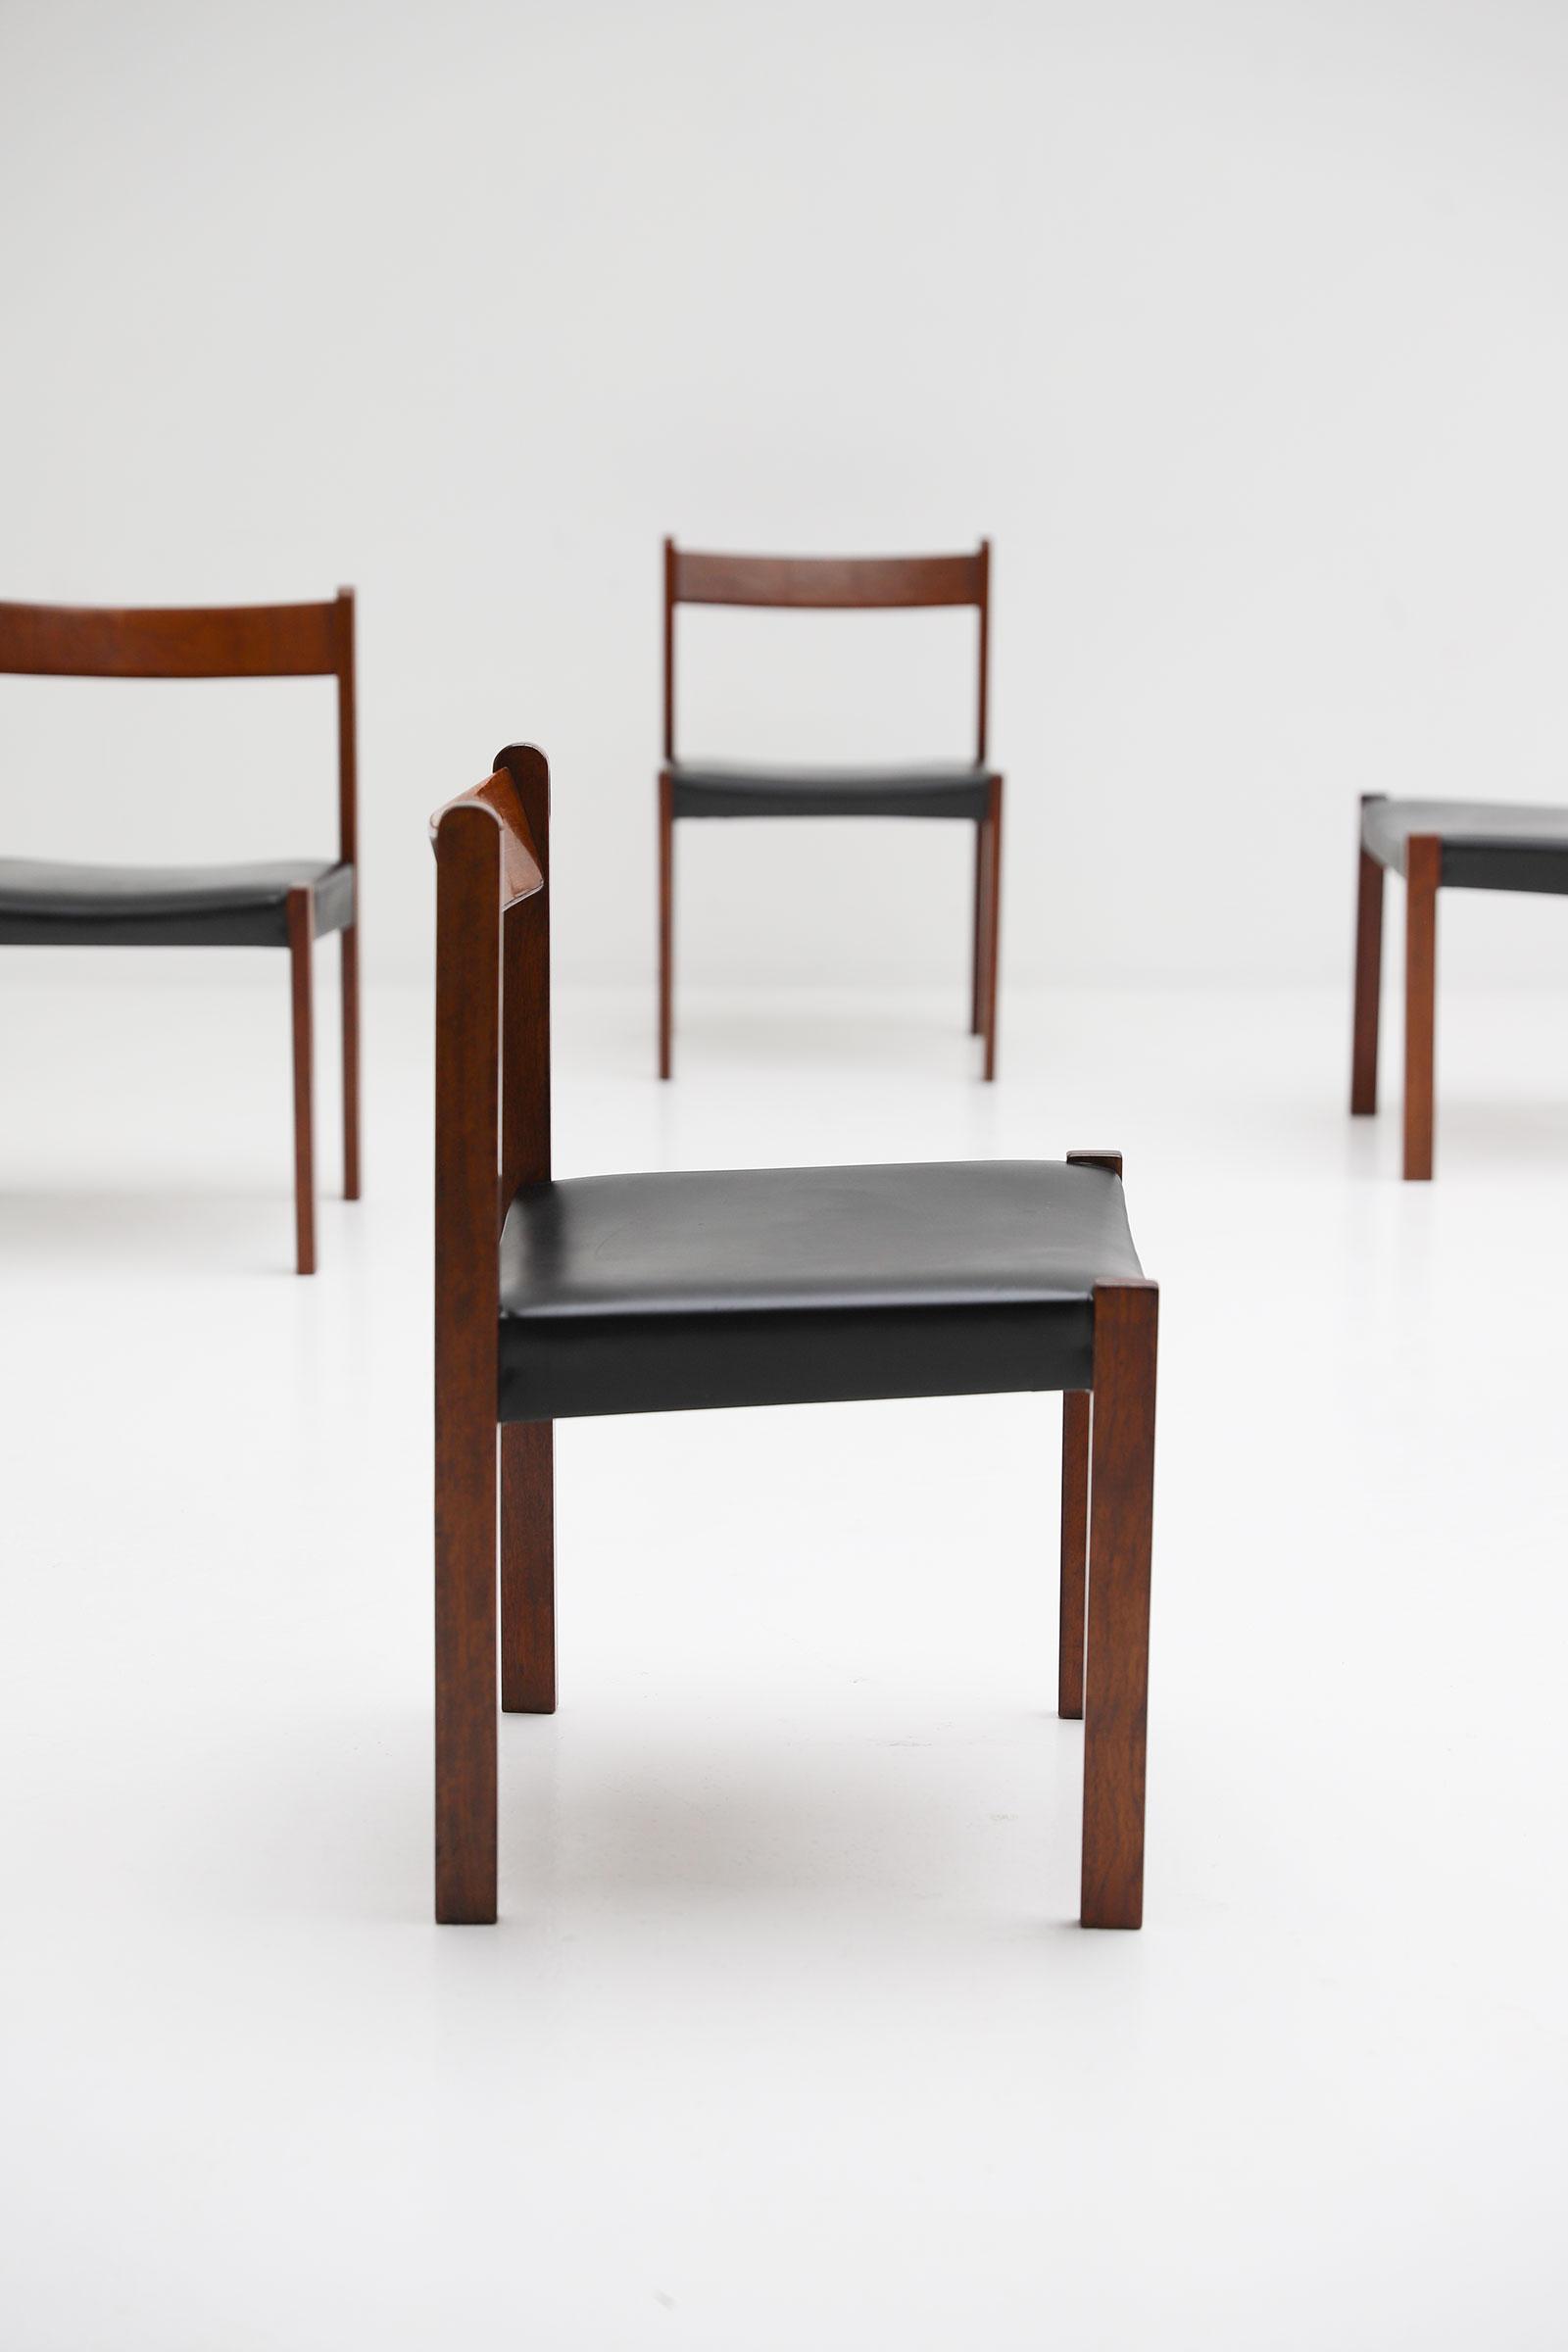 Alfred Hendrickx Belform Chairsimage 8